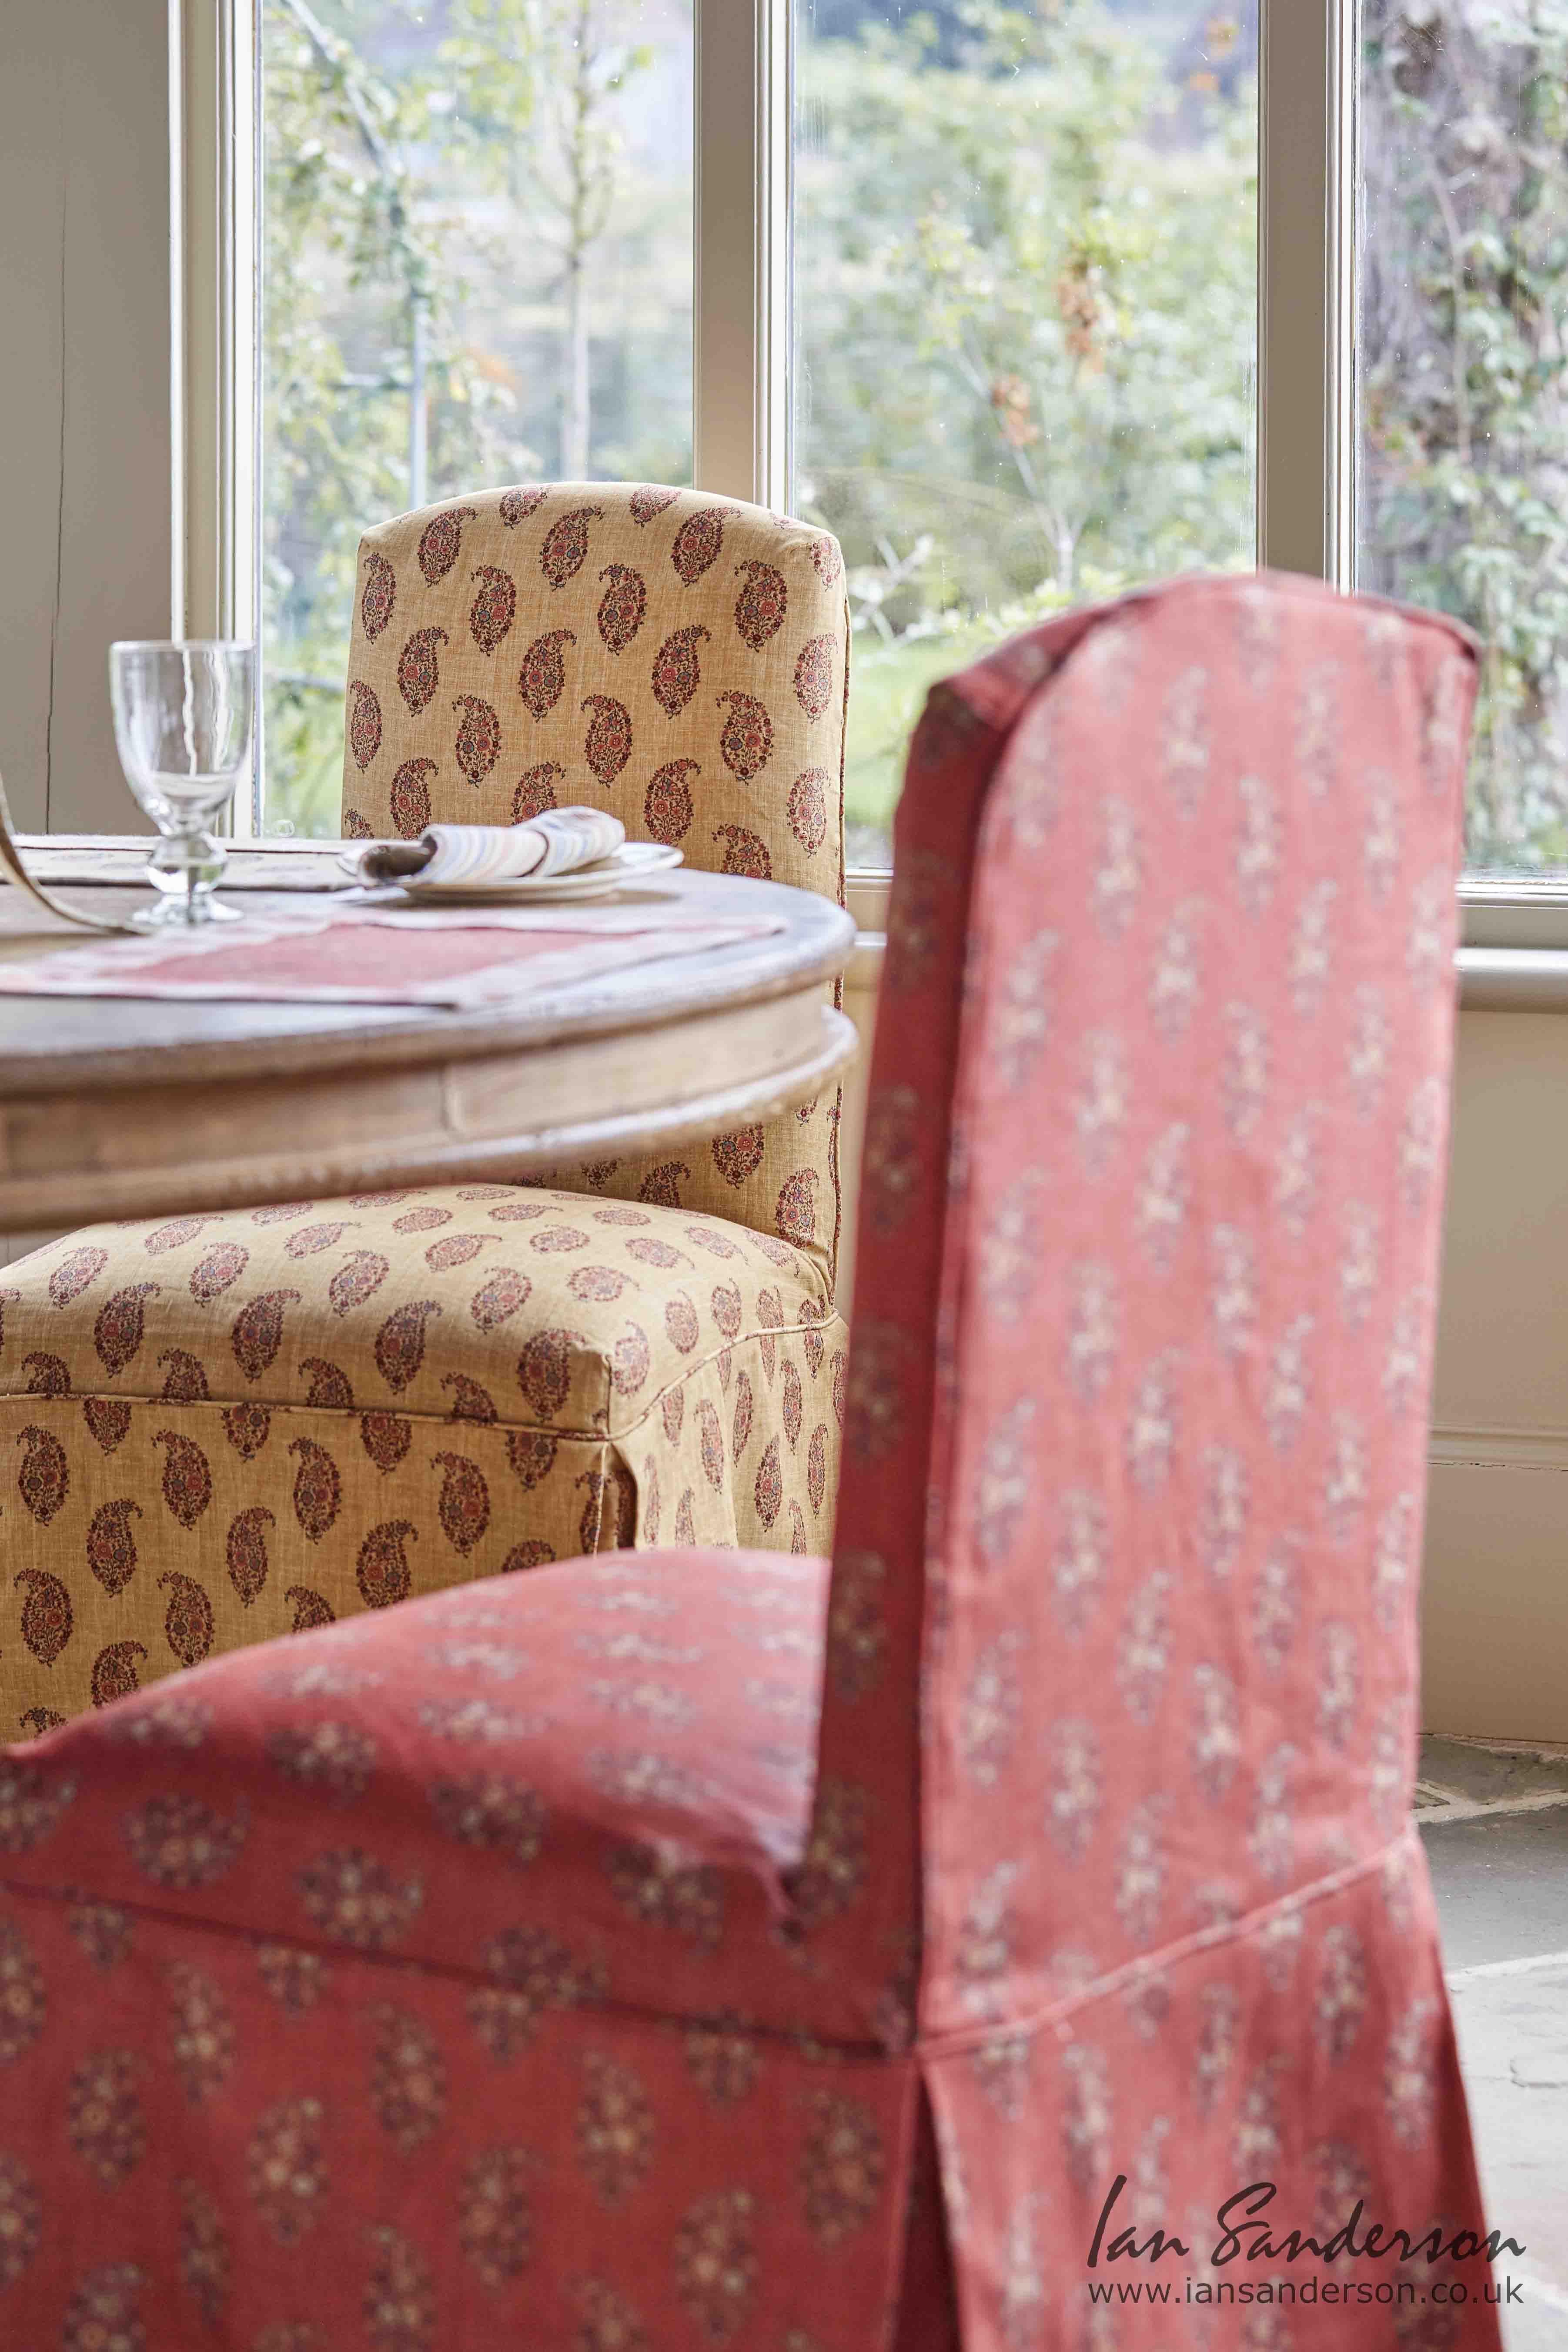 Dining chairs jessamy jaipur paprika paisley print jaipur herringbone dining chairs